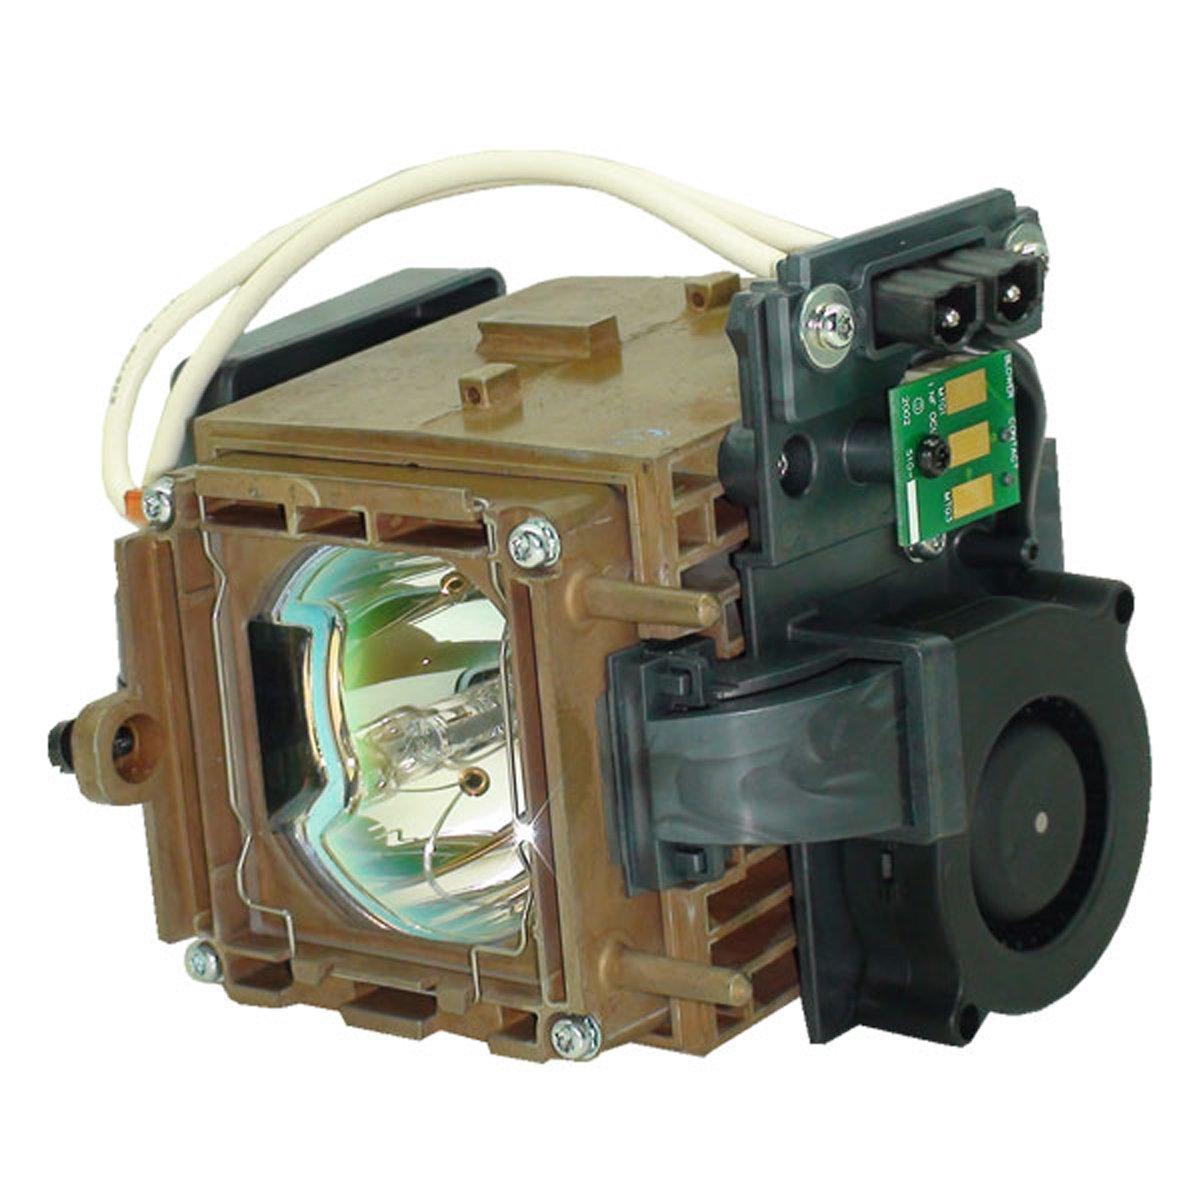 SpArc プロジェクター交換用ランプ 囲い/電球付き RCA SP61MD10YX1用 Economy Economy Lamp with Housing B07MPSKR7V